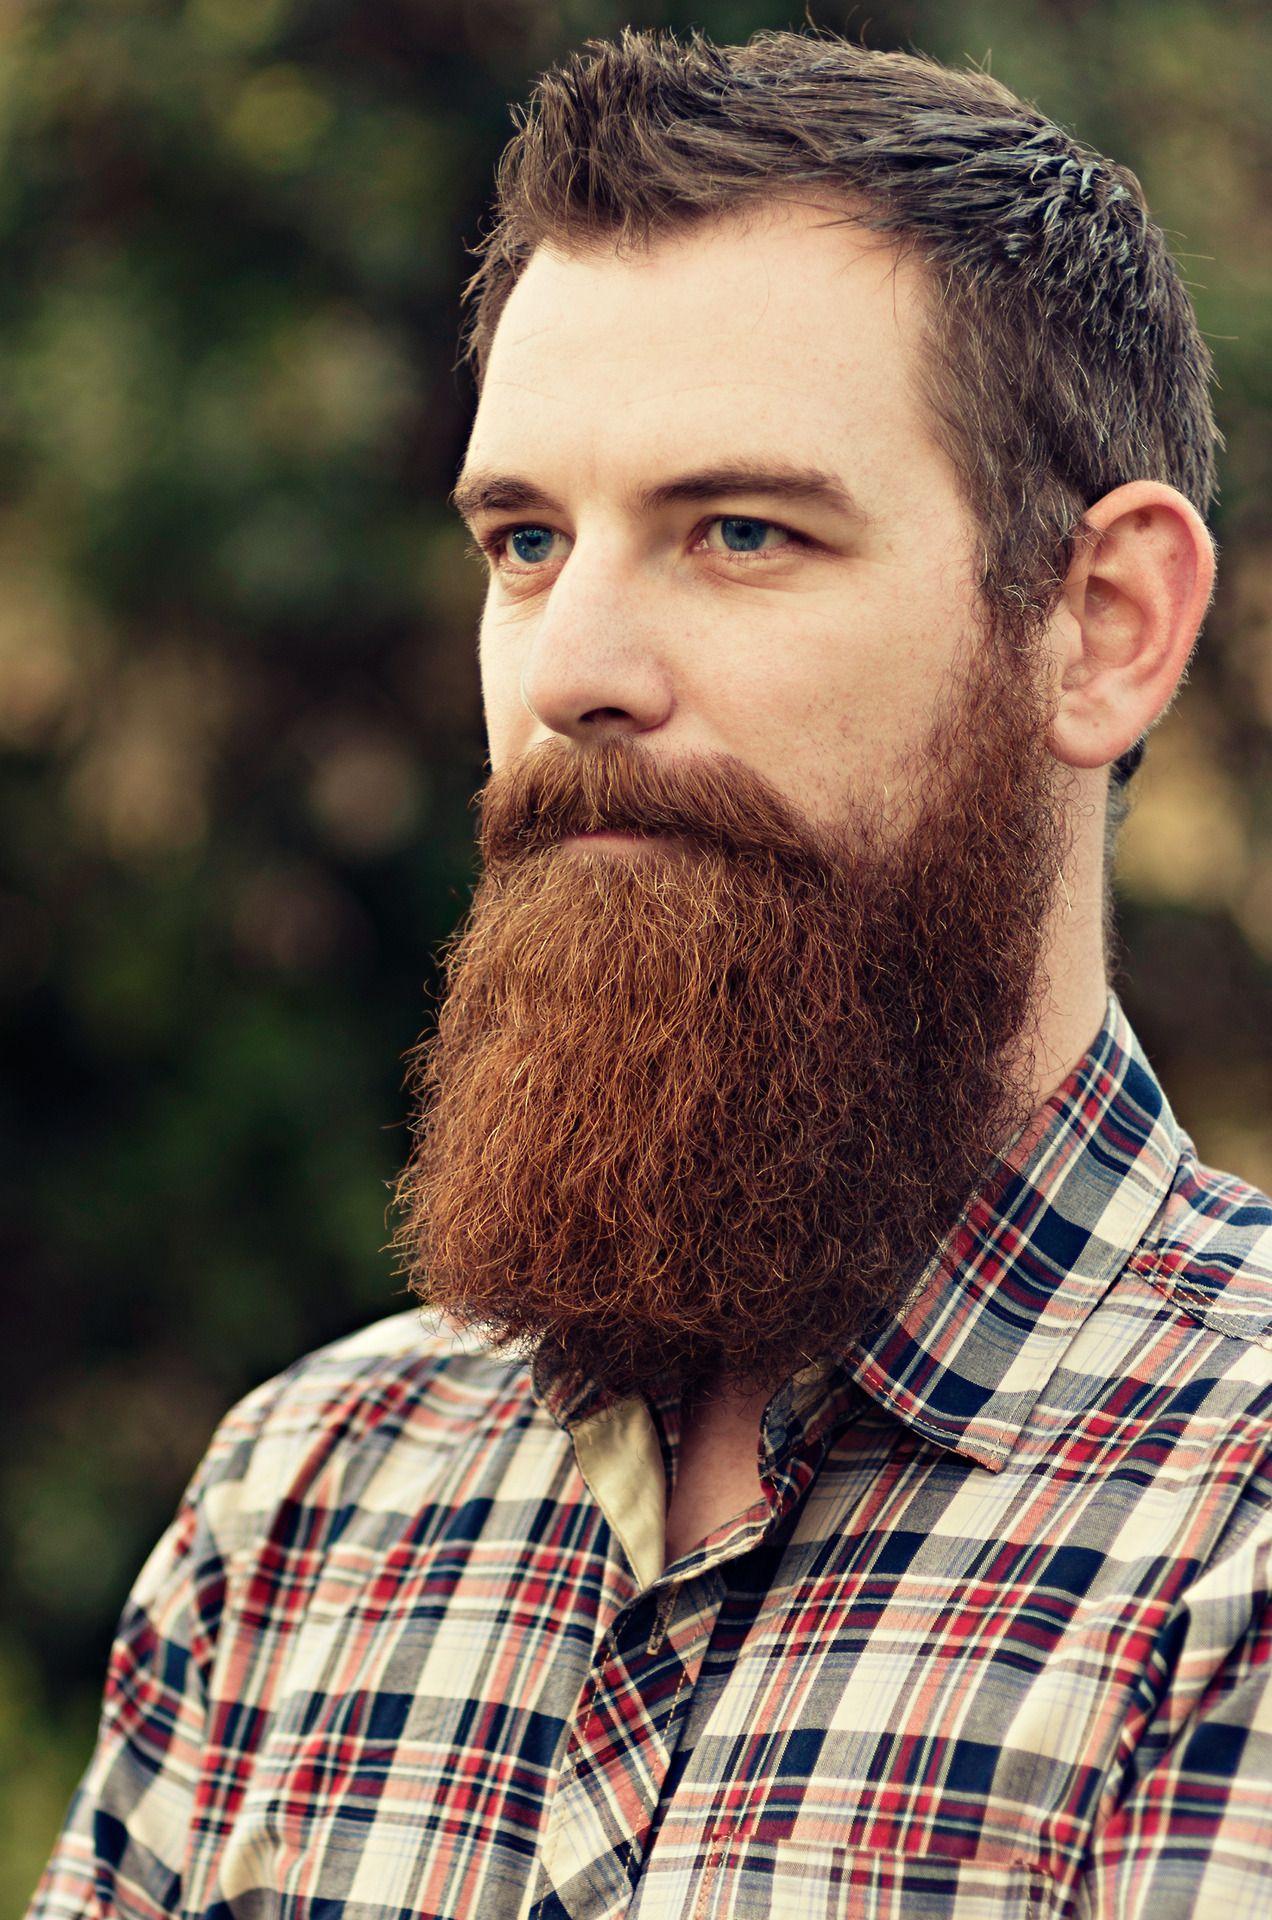 Groovy 1000 Images About Beard On Pinterest Short Hairstyles Gunalazisus